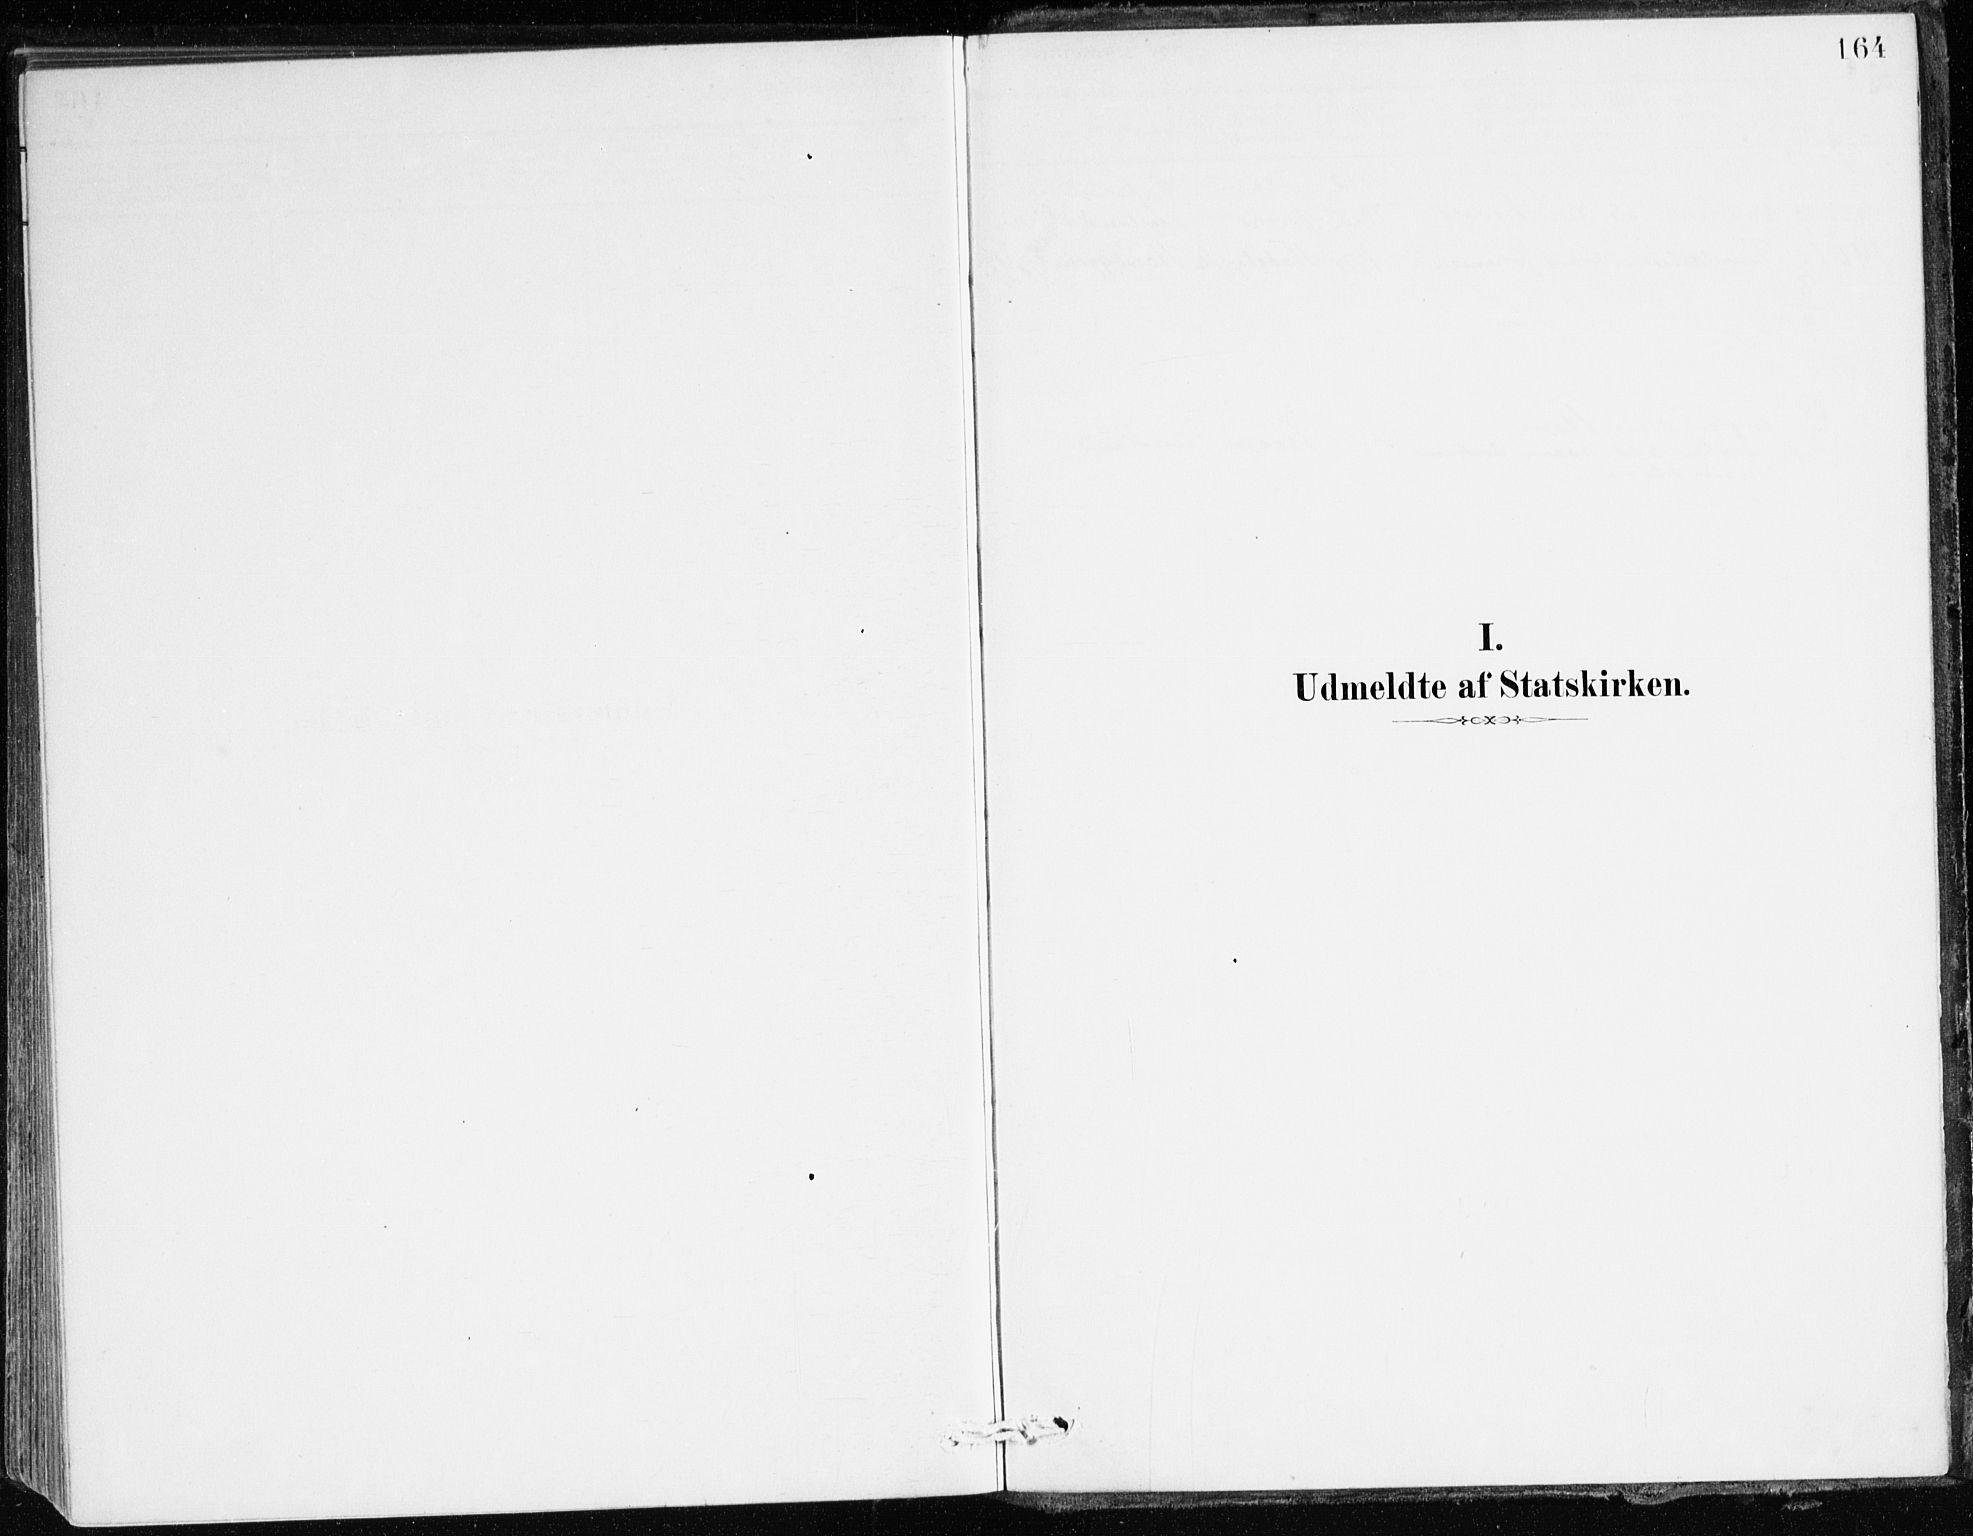 SAB, Aurland Sokneprestembete*, Ministerialbok nr. C 1, 1880-1921, s. 164